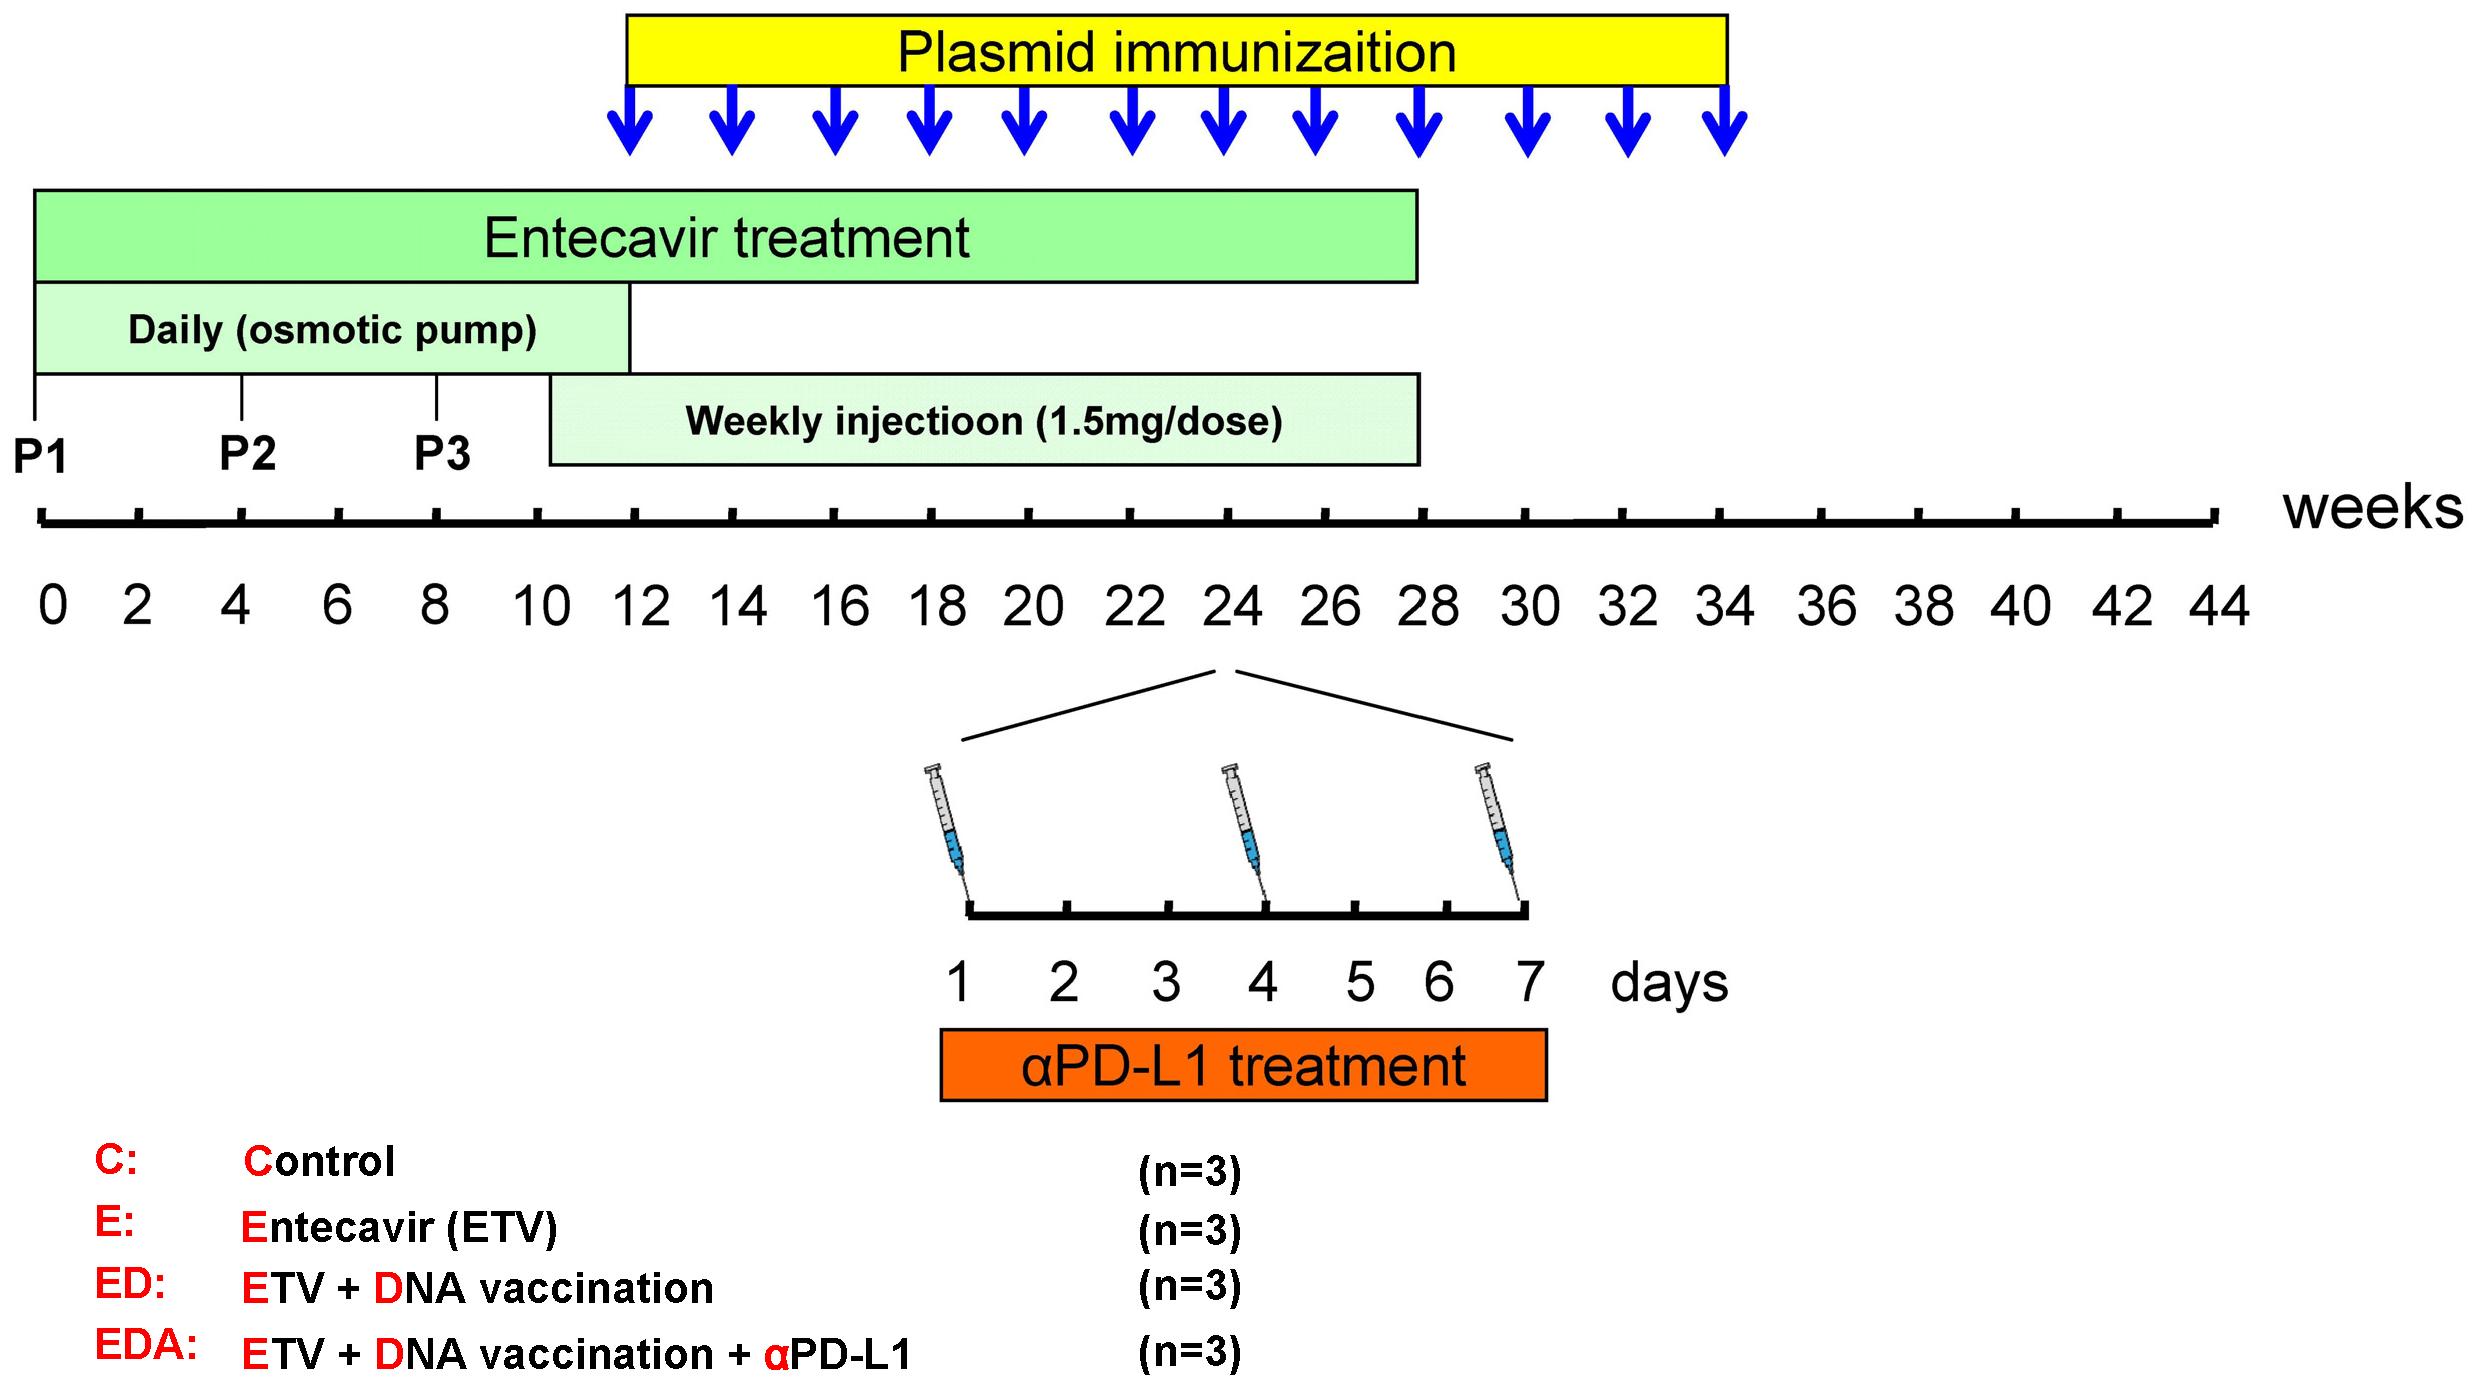 Schema of triple combination therapy of ETV treatment, DNA vaccination and <i>in vivo</i> PD-L1 blockade.